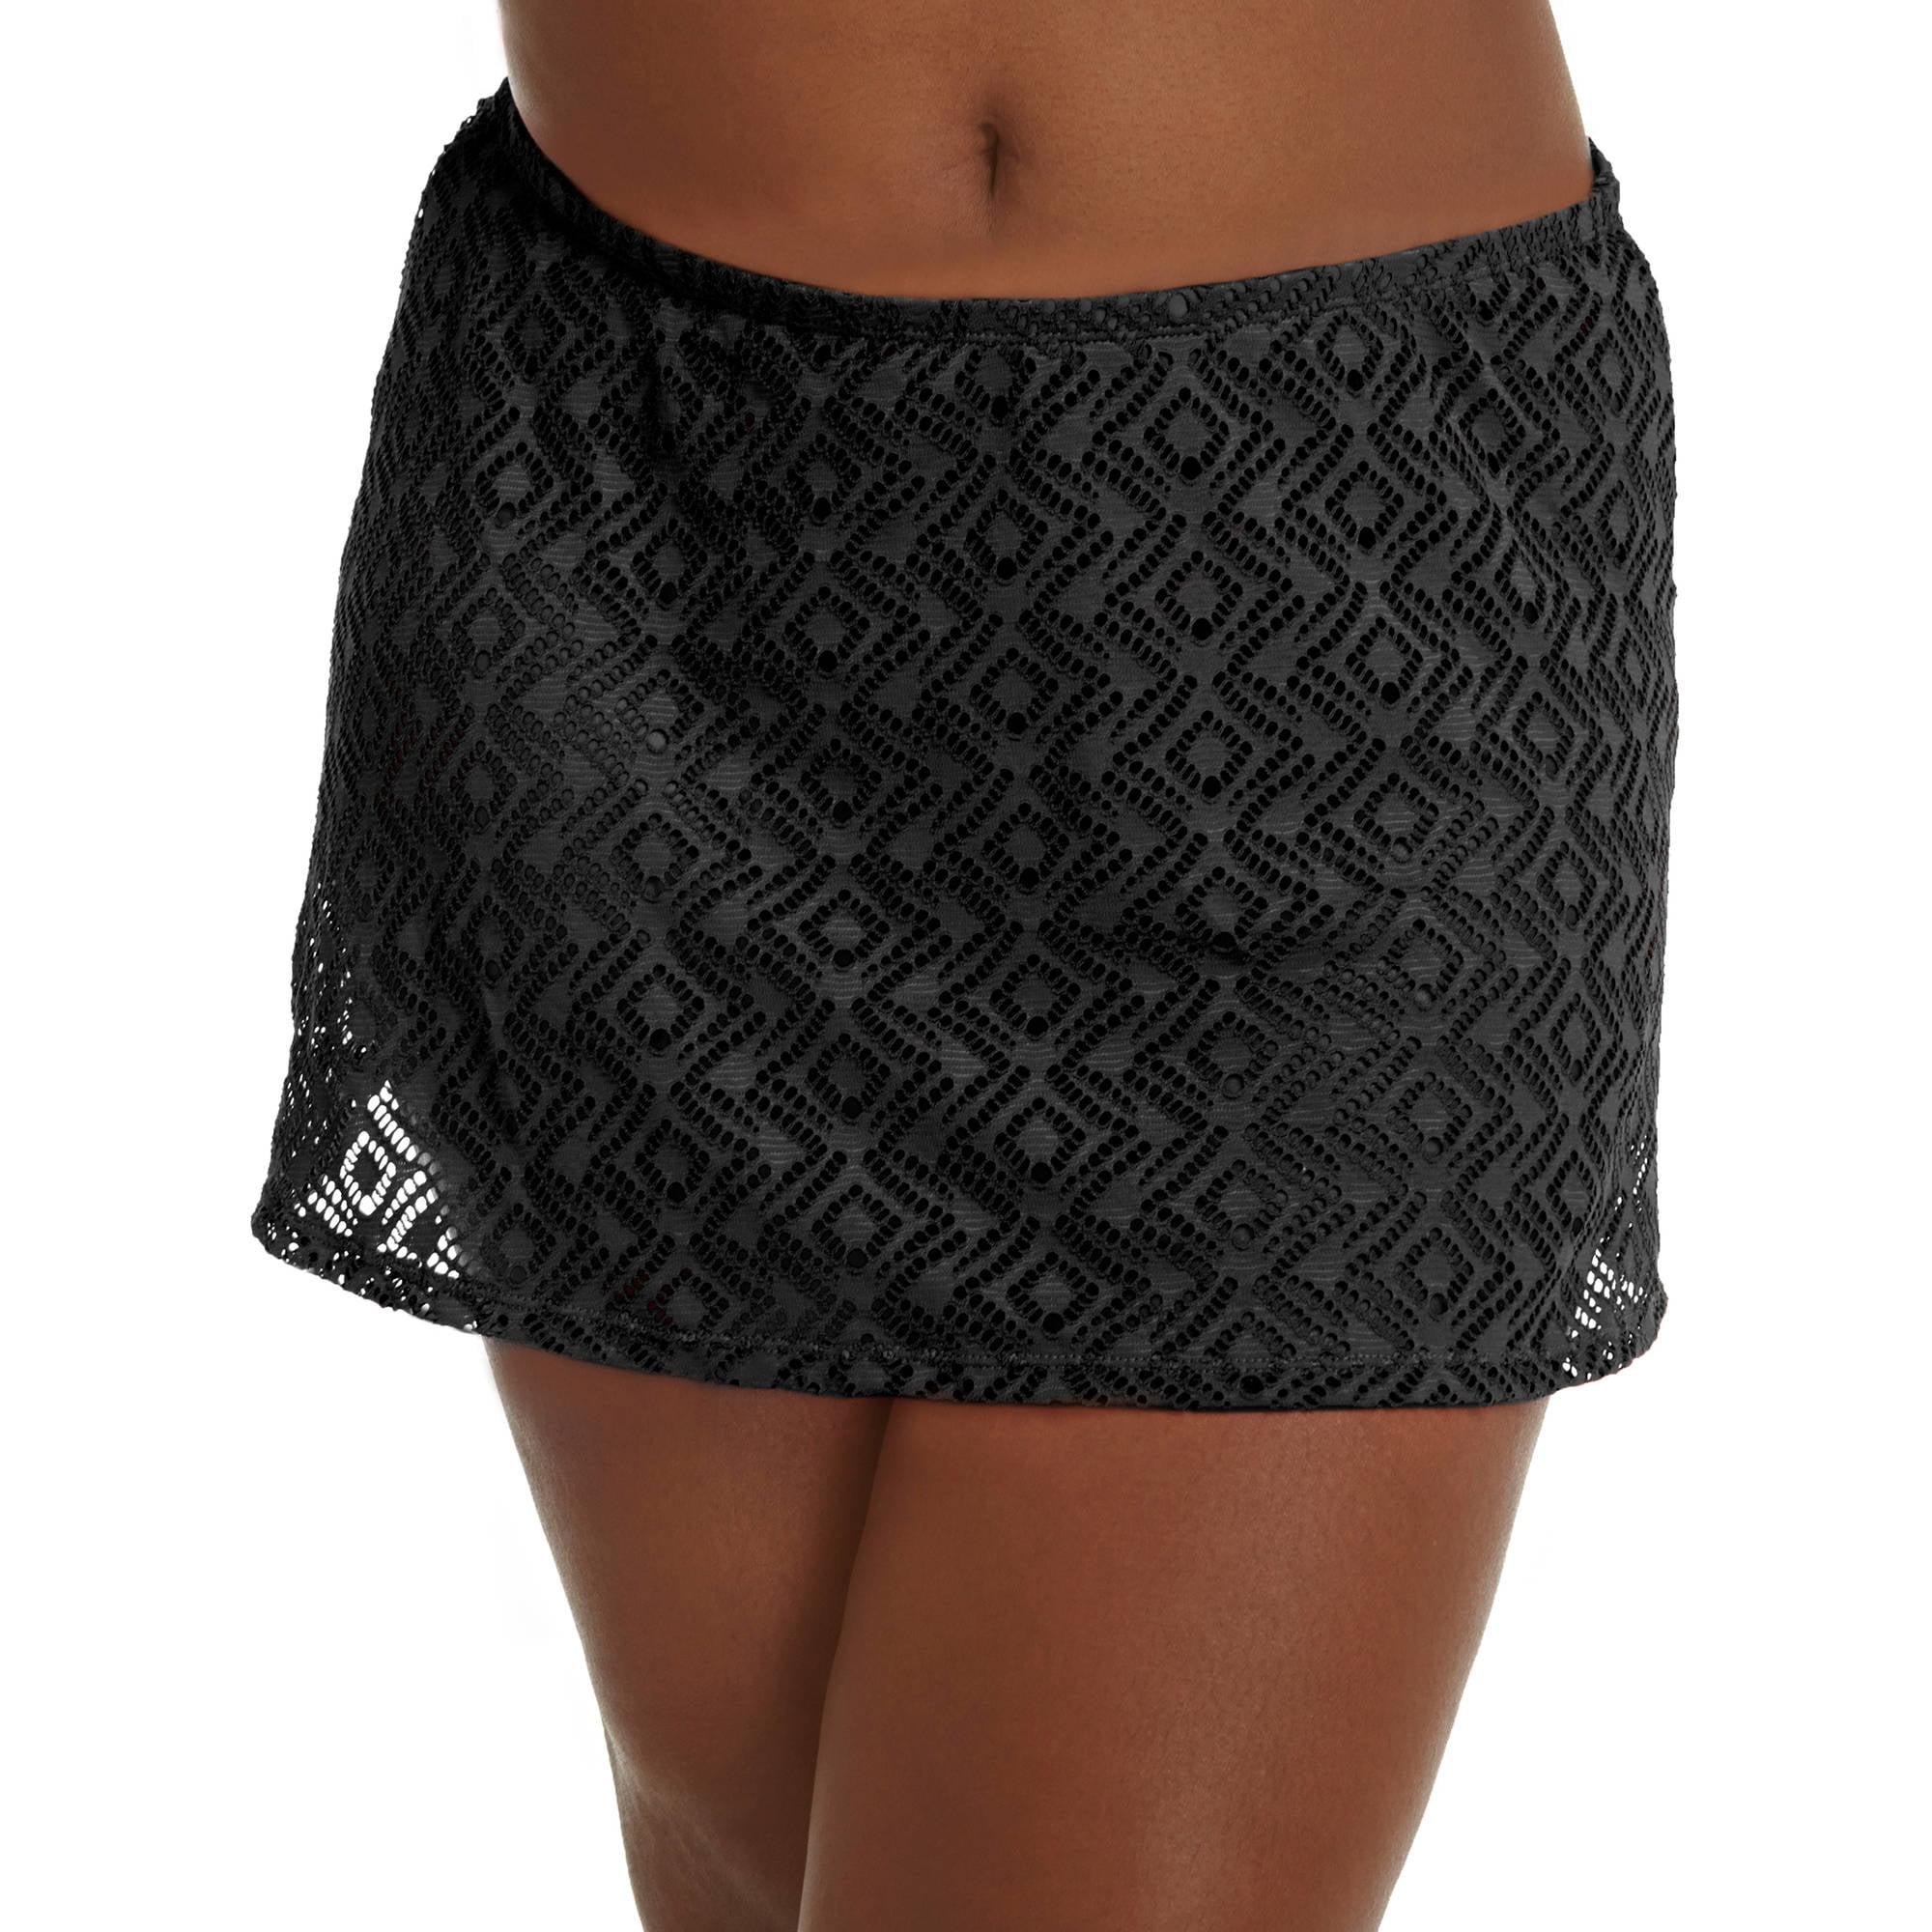 ed9658e209c23 HDE - Women's Retro One Piece Swimsuit Plus Size Padded Halter Vintage  Swimsuit (Colorblock Monokini, X-Large) - Walmart.com